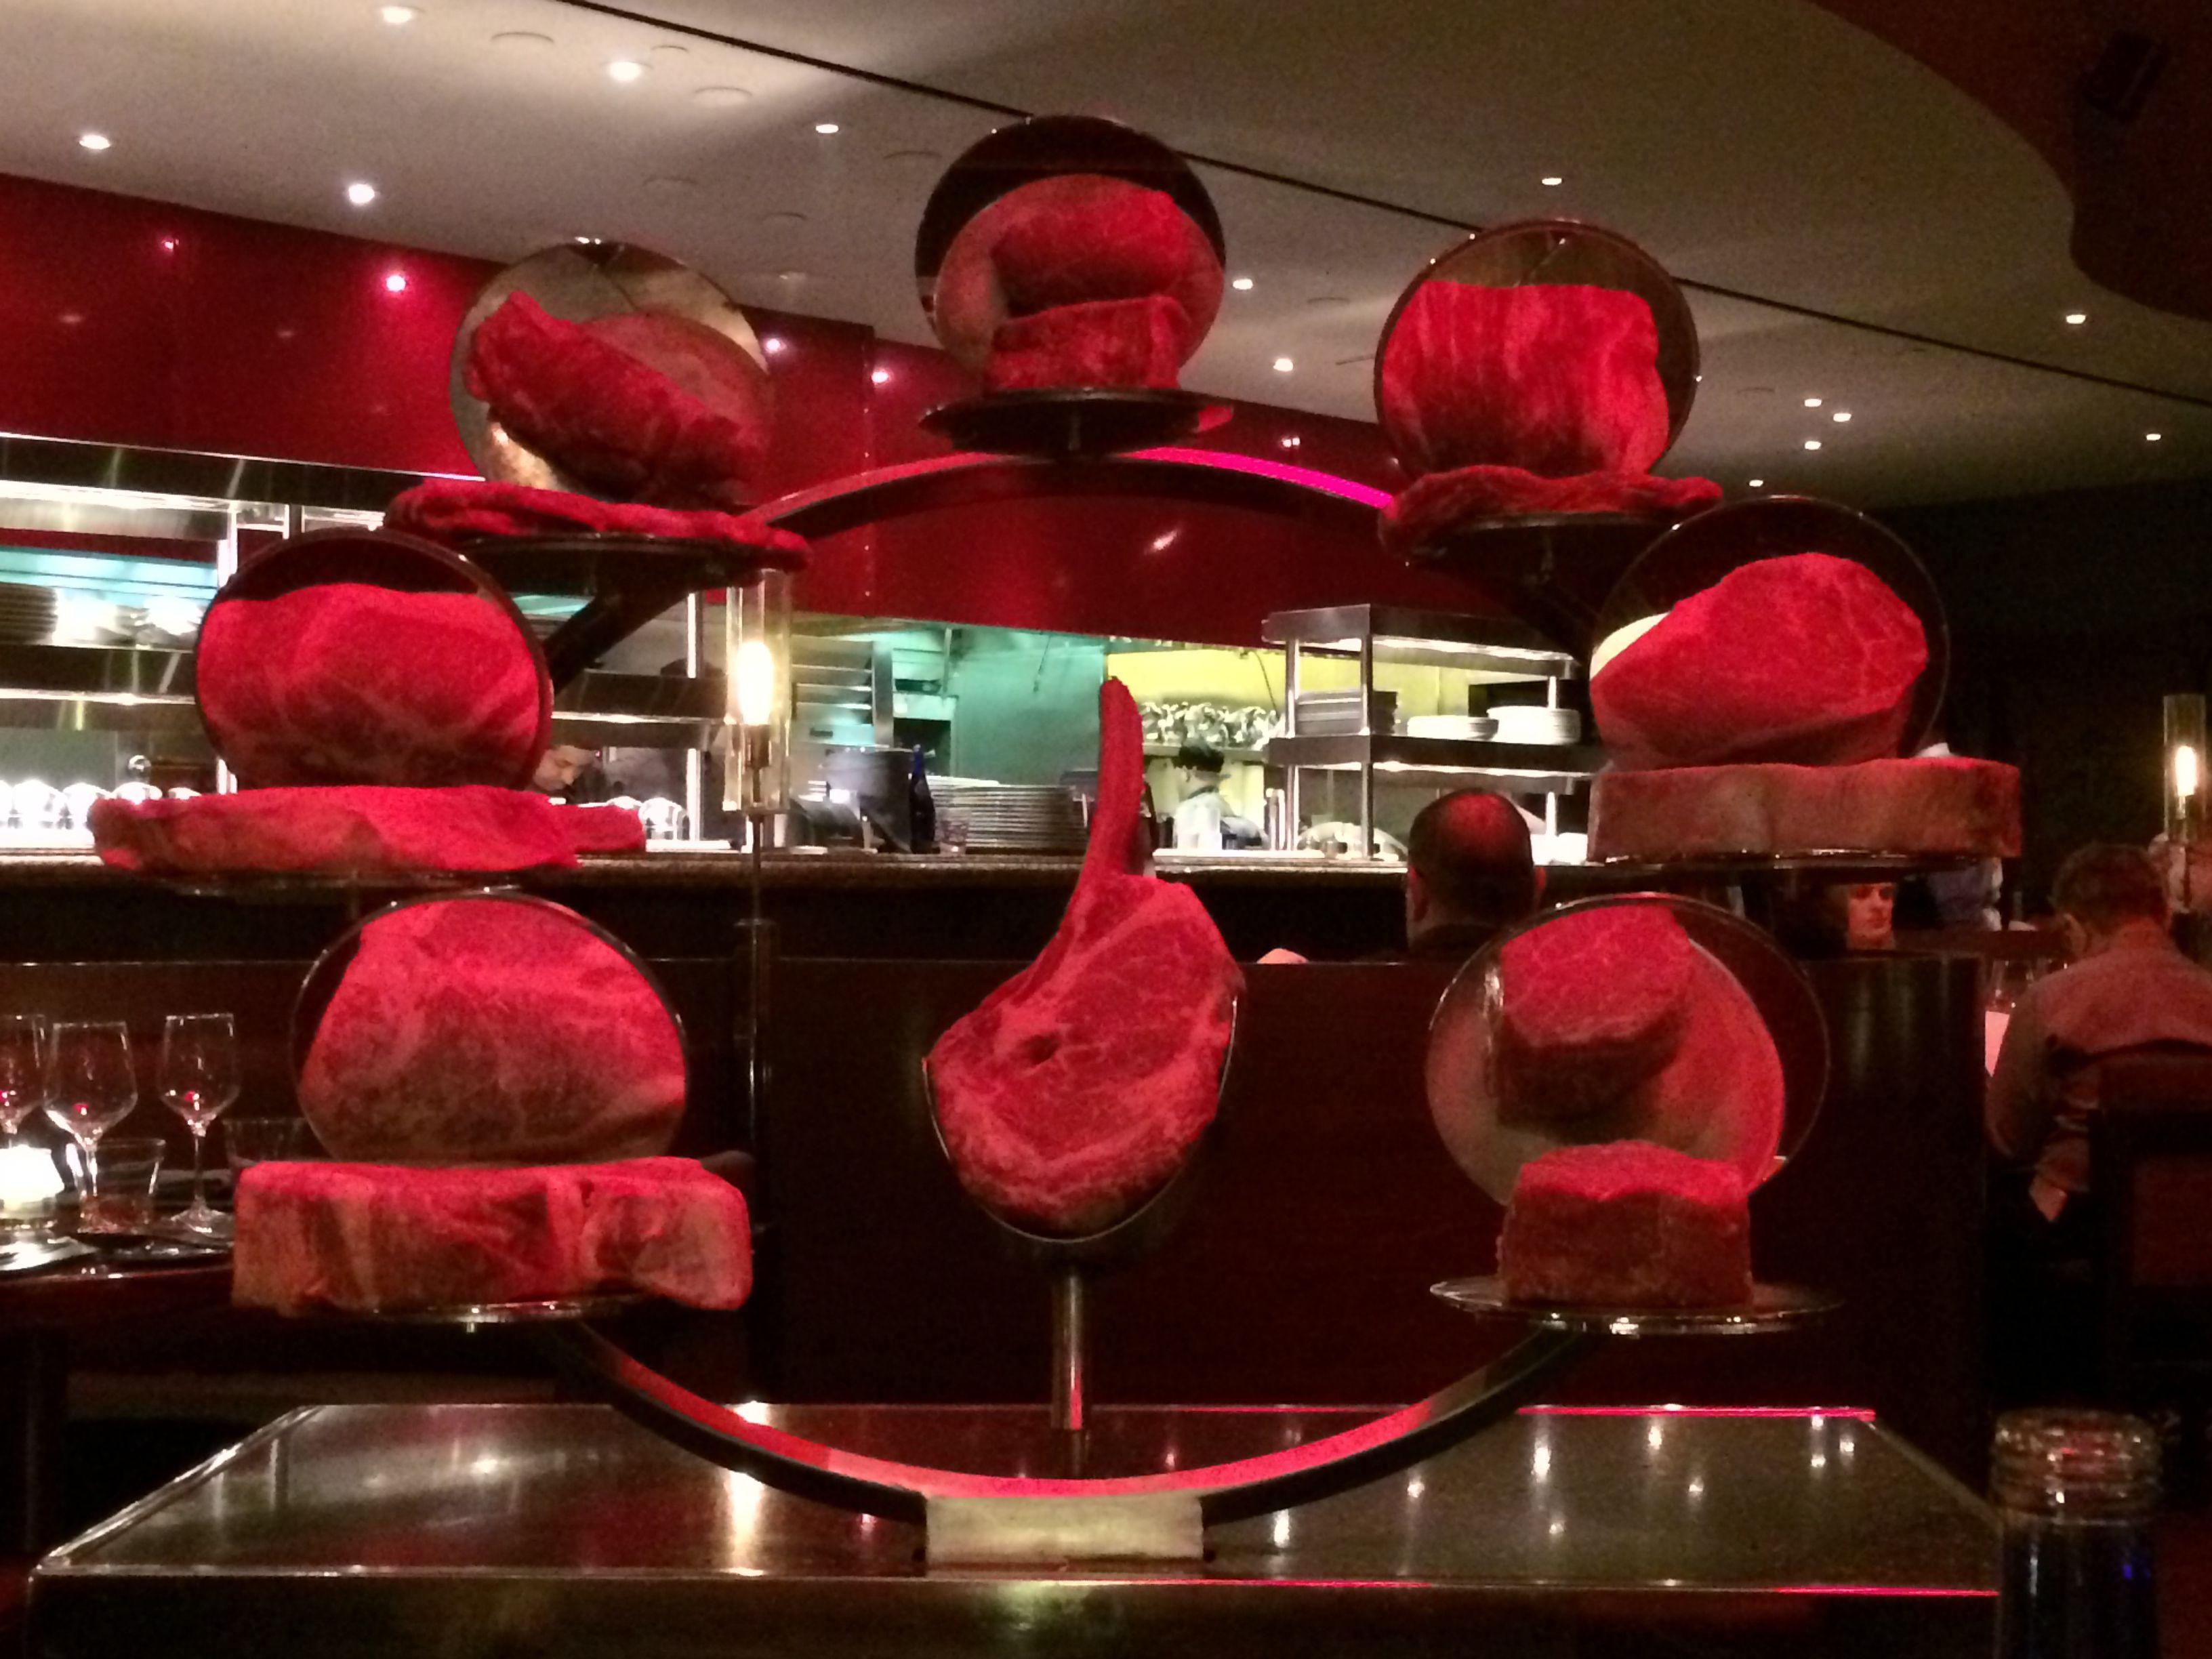 Wheel Of Steak Selection At Gordon Ramsay Steakhouse In Las Vegas Gordon Ramsay Ramsay Steakhouse